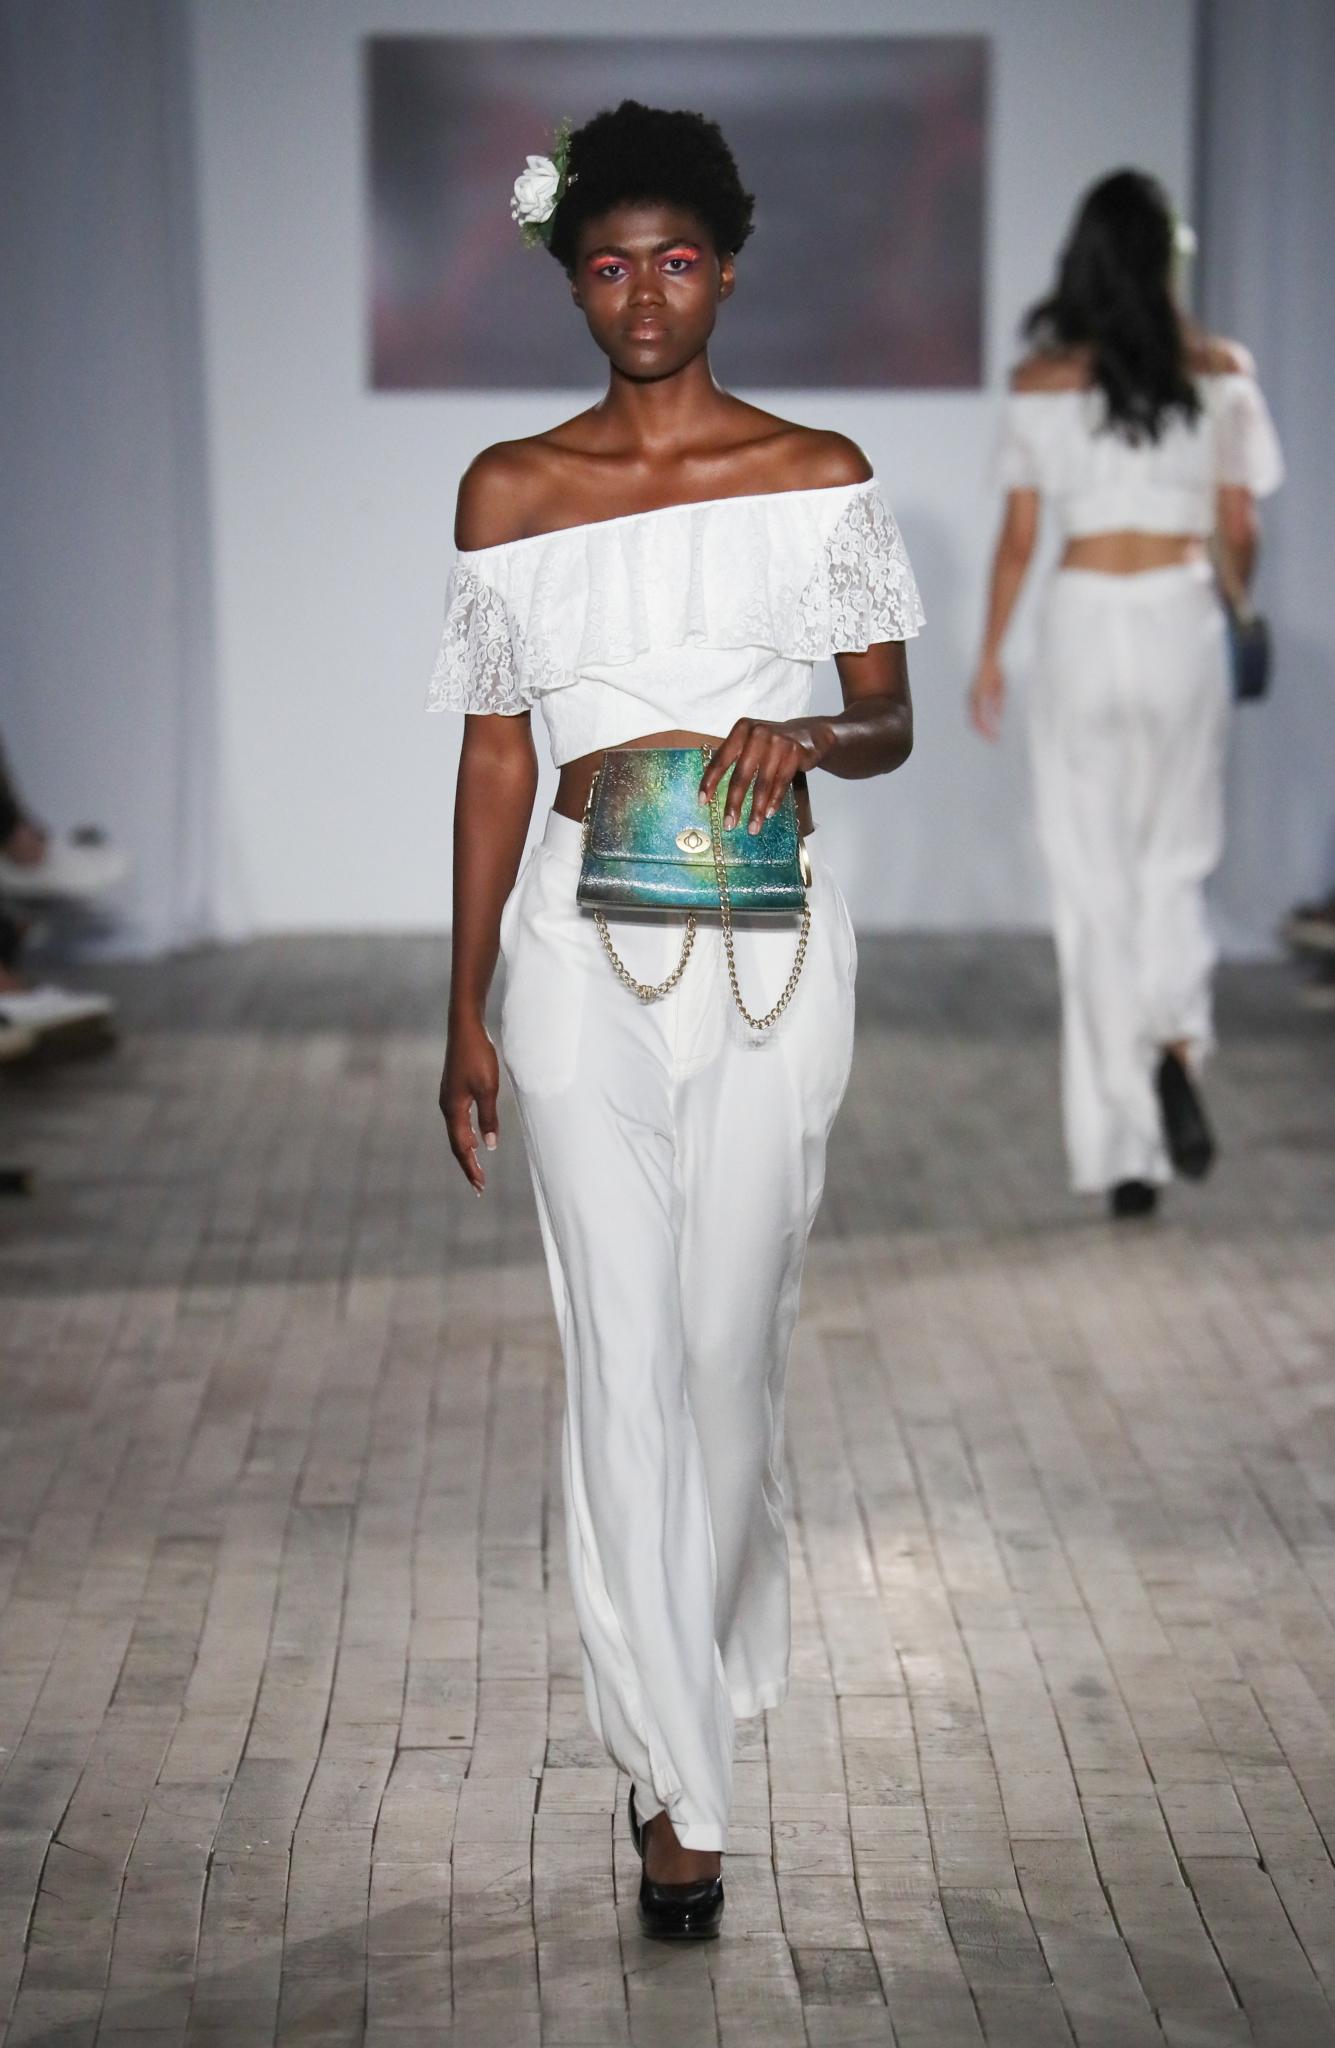 Aranyani Spring 2019 NYFW Nolcha